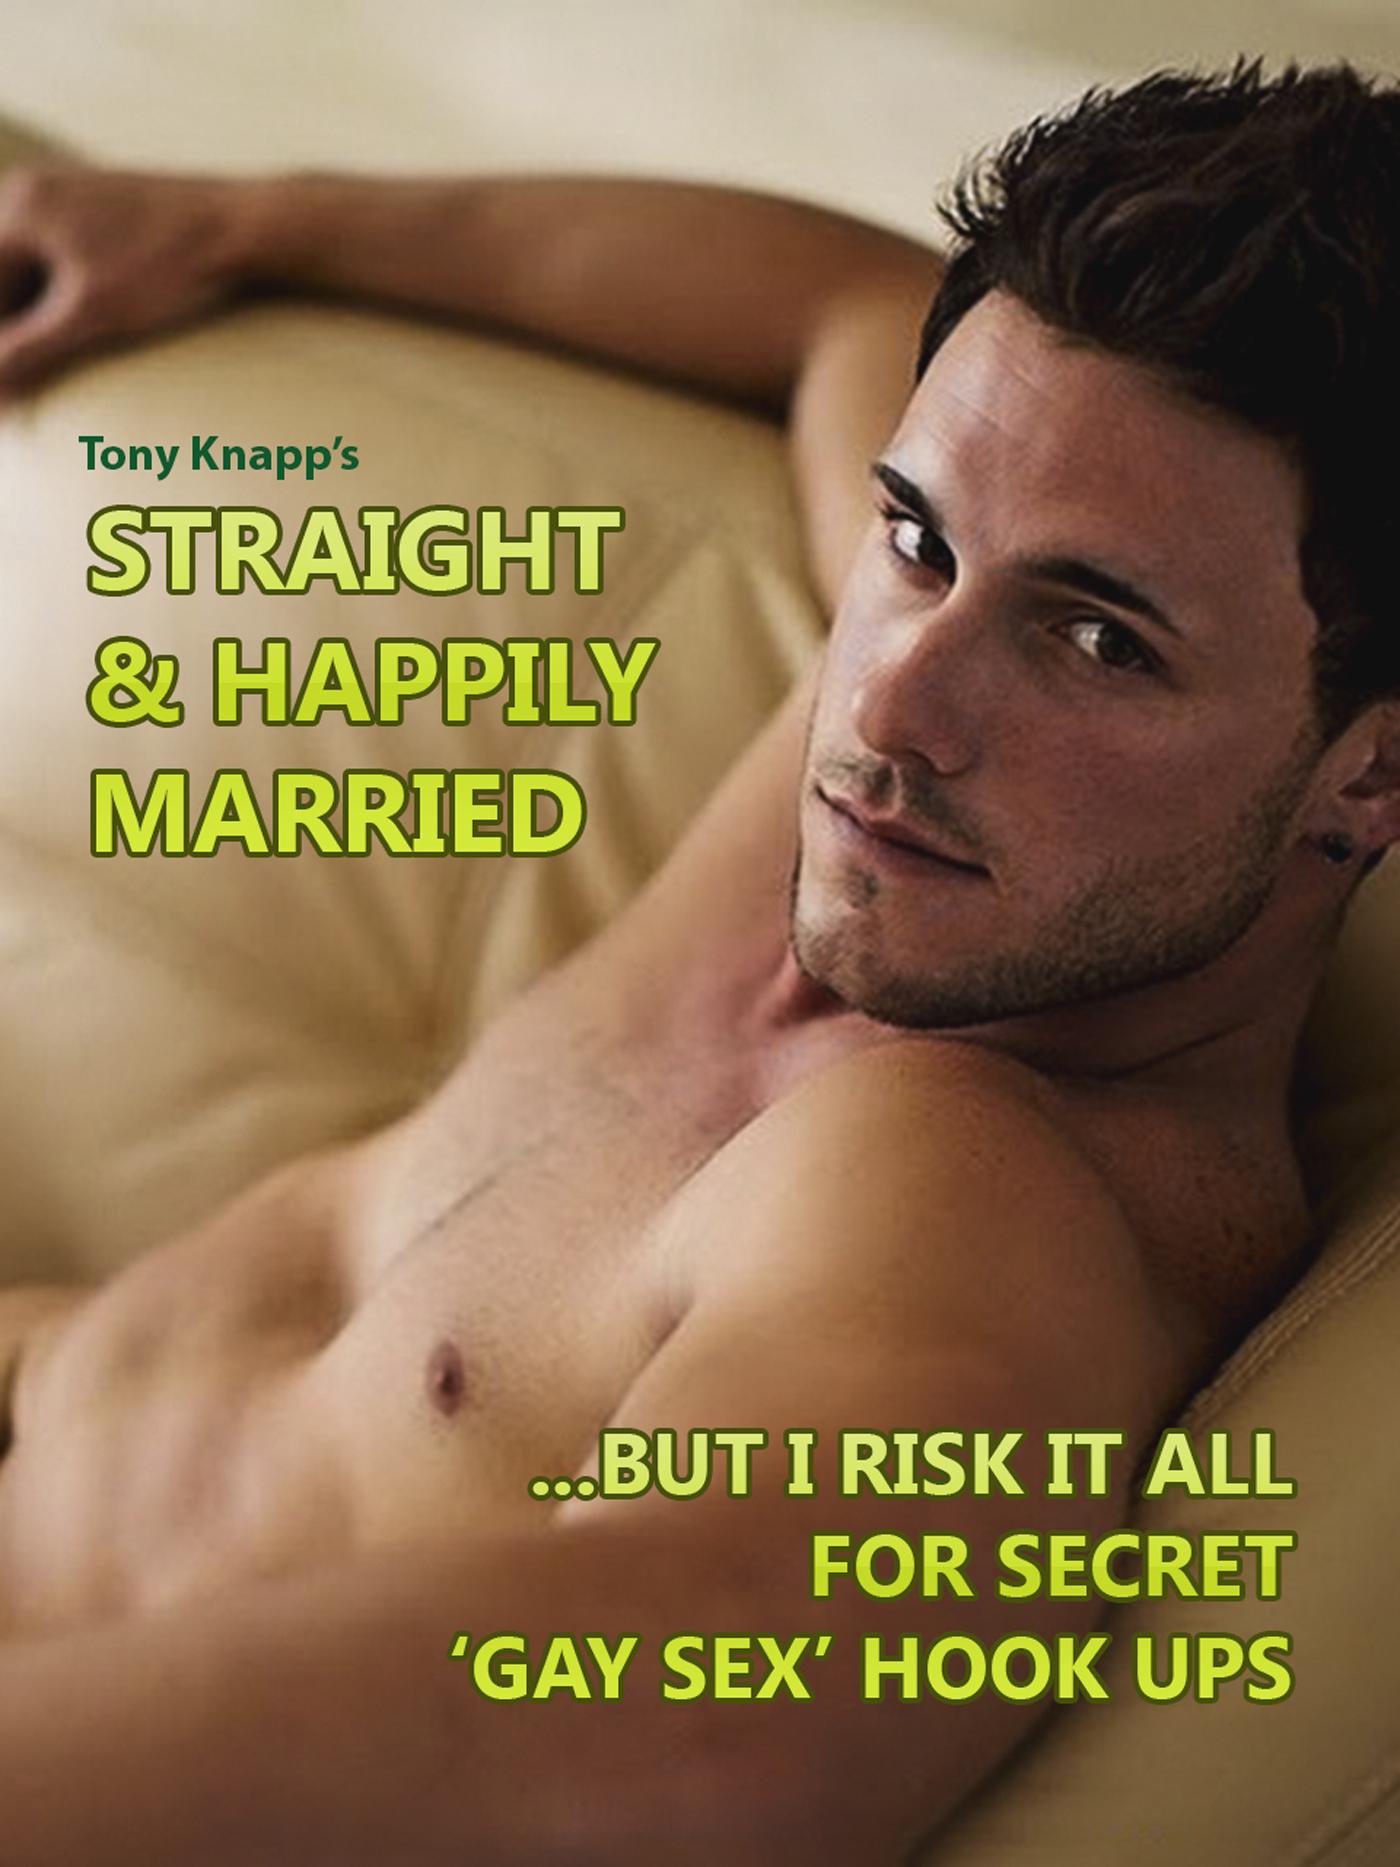 Tony Knapp - Straight & Happily Married...But I Risk it All for Secret 'Gay Sex' Hook Ups